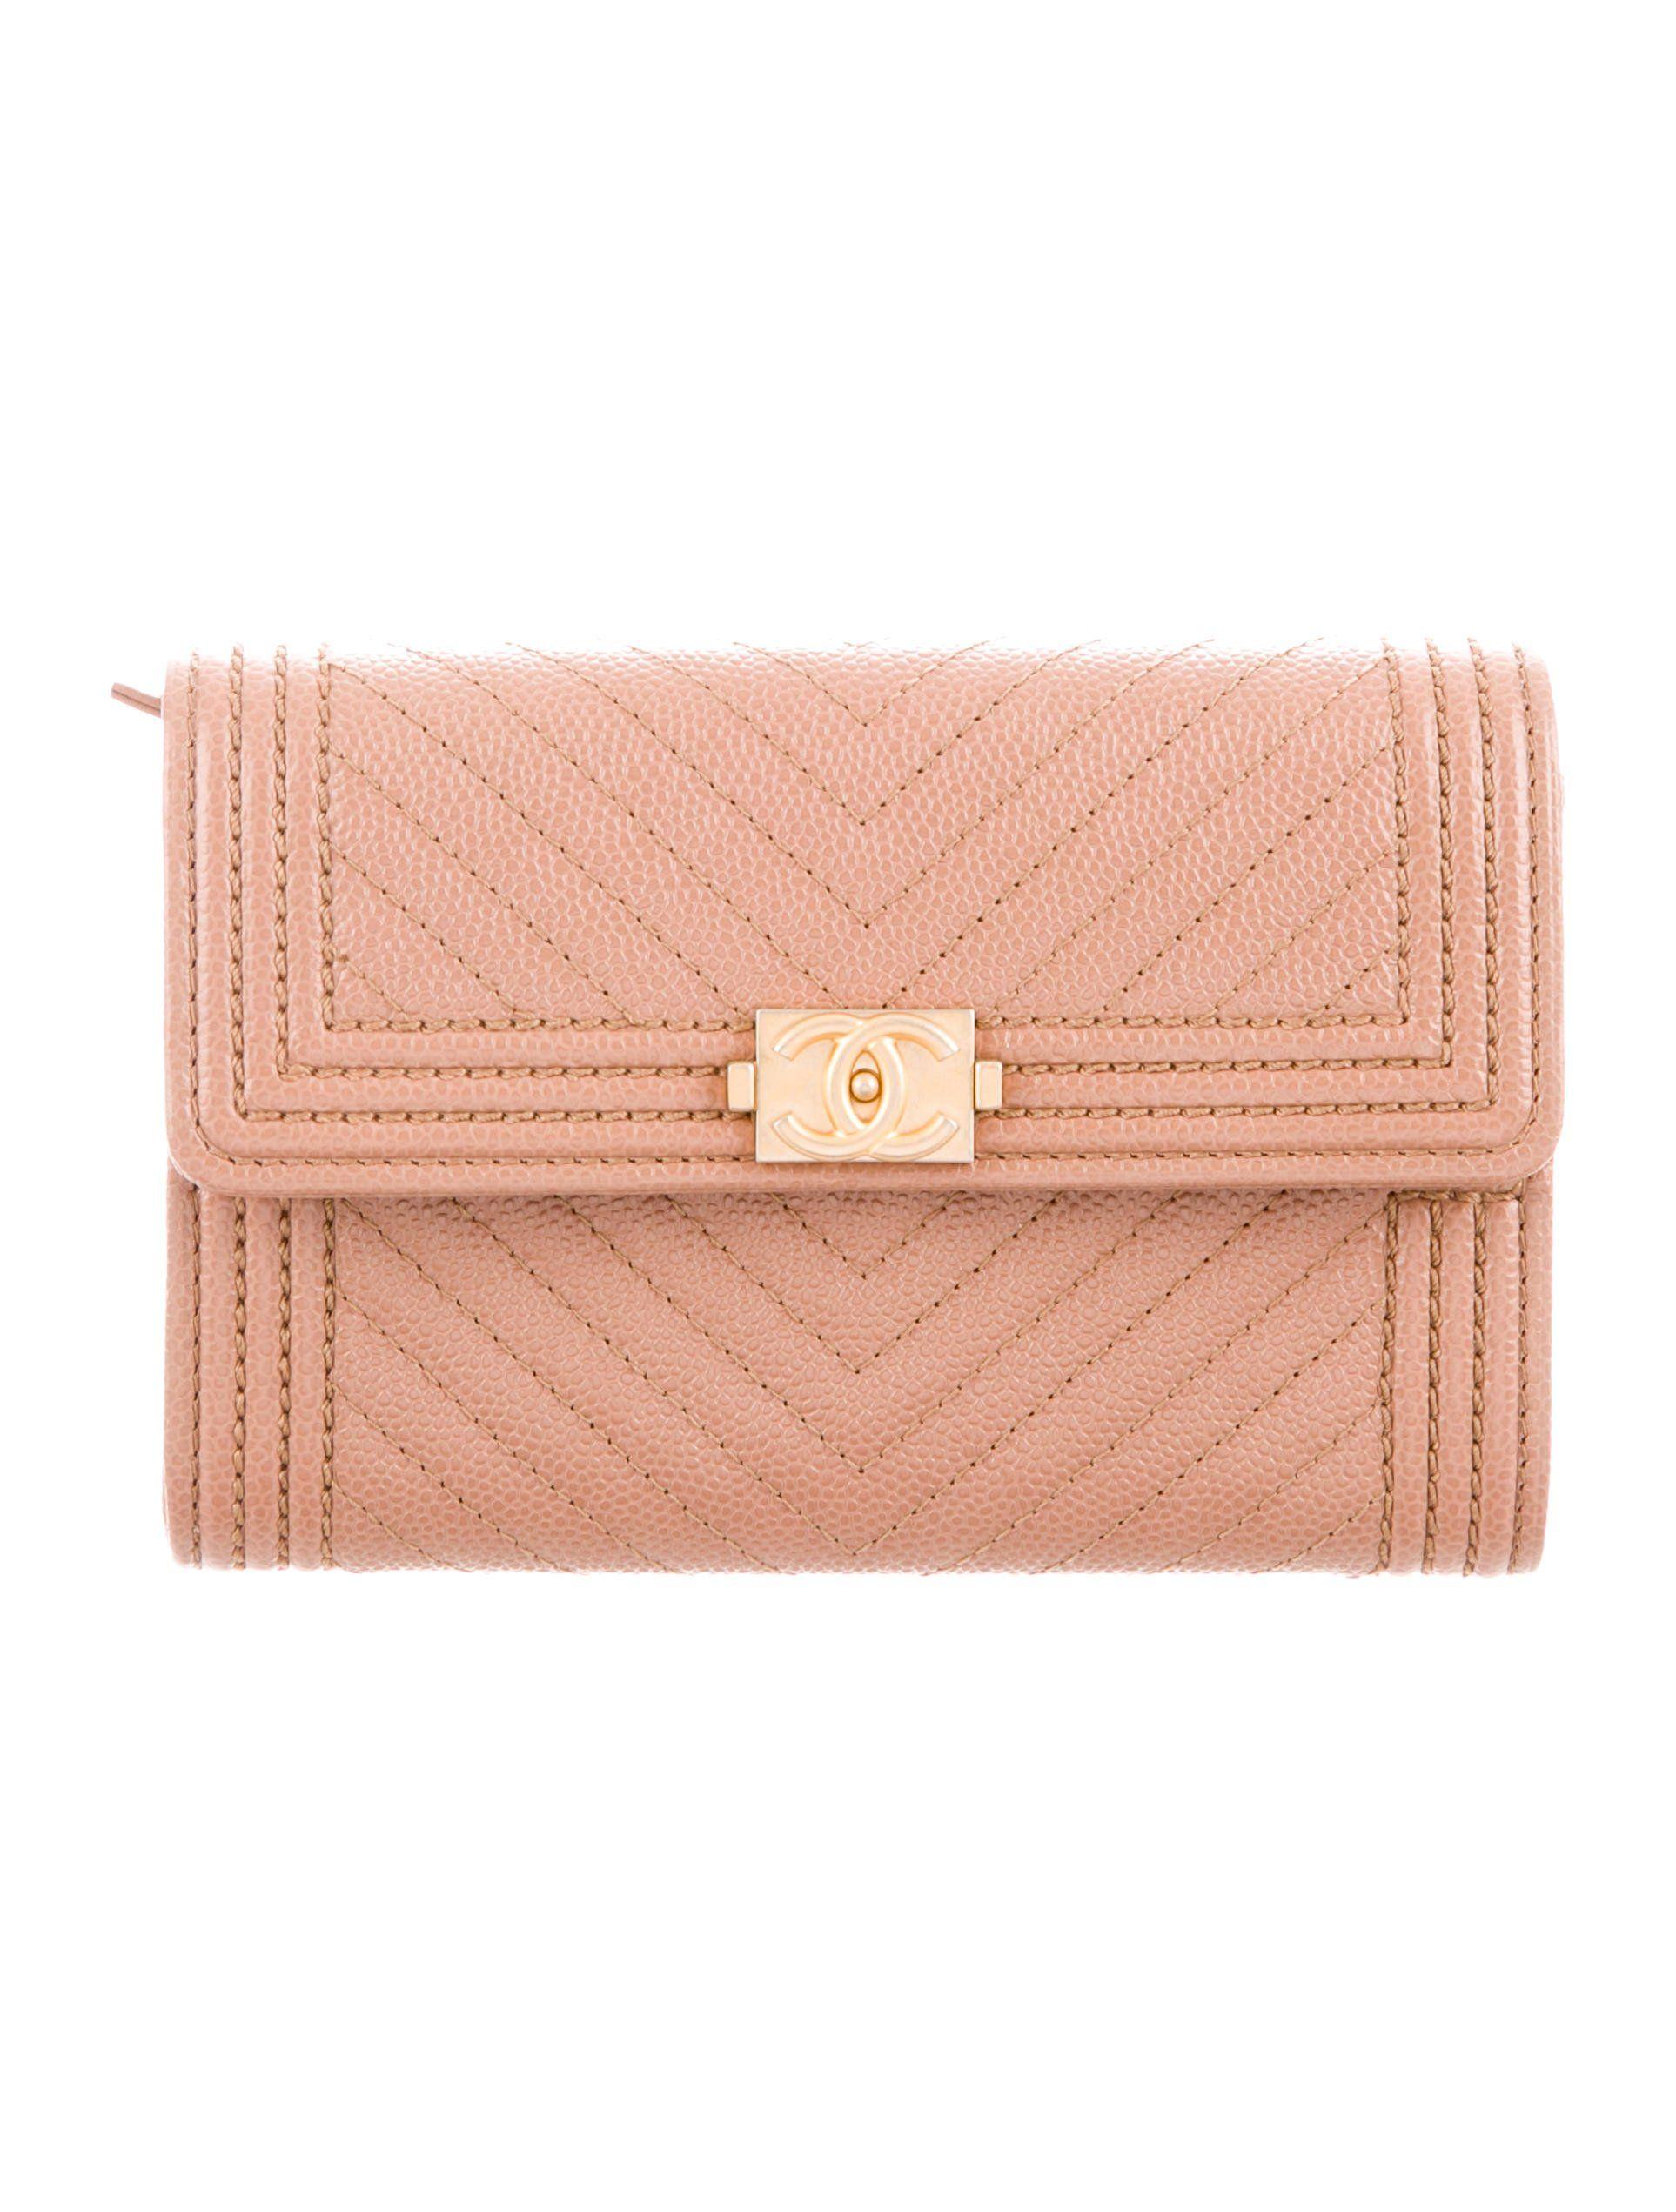 chanel card wallet flap